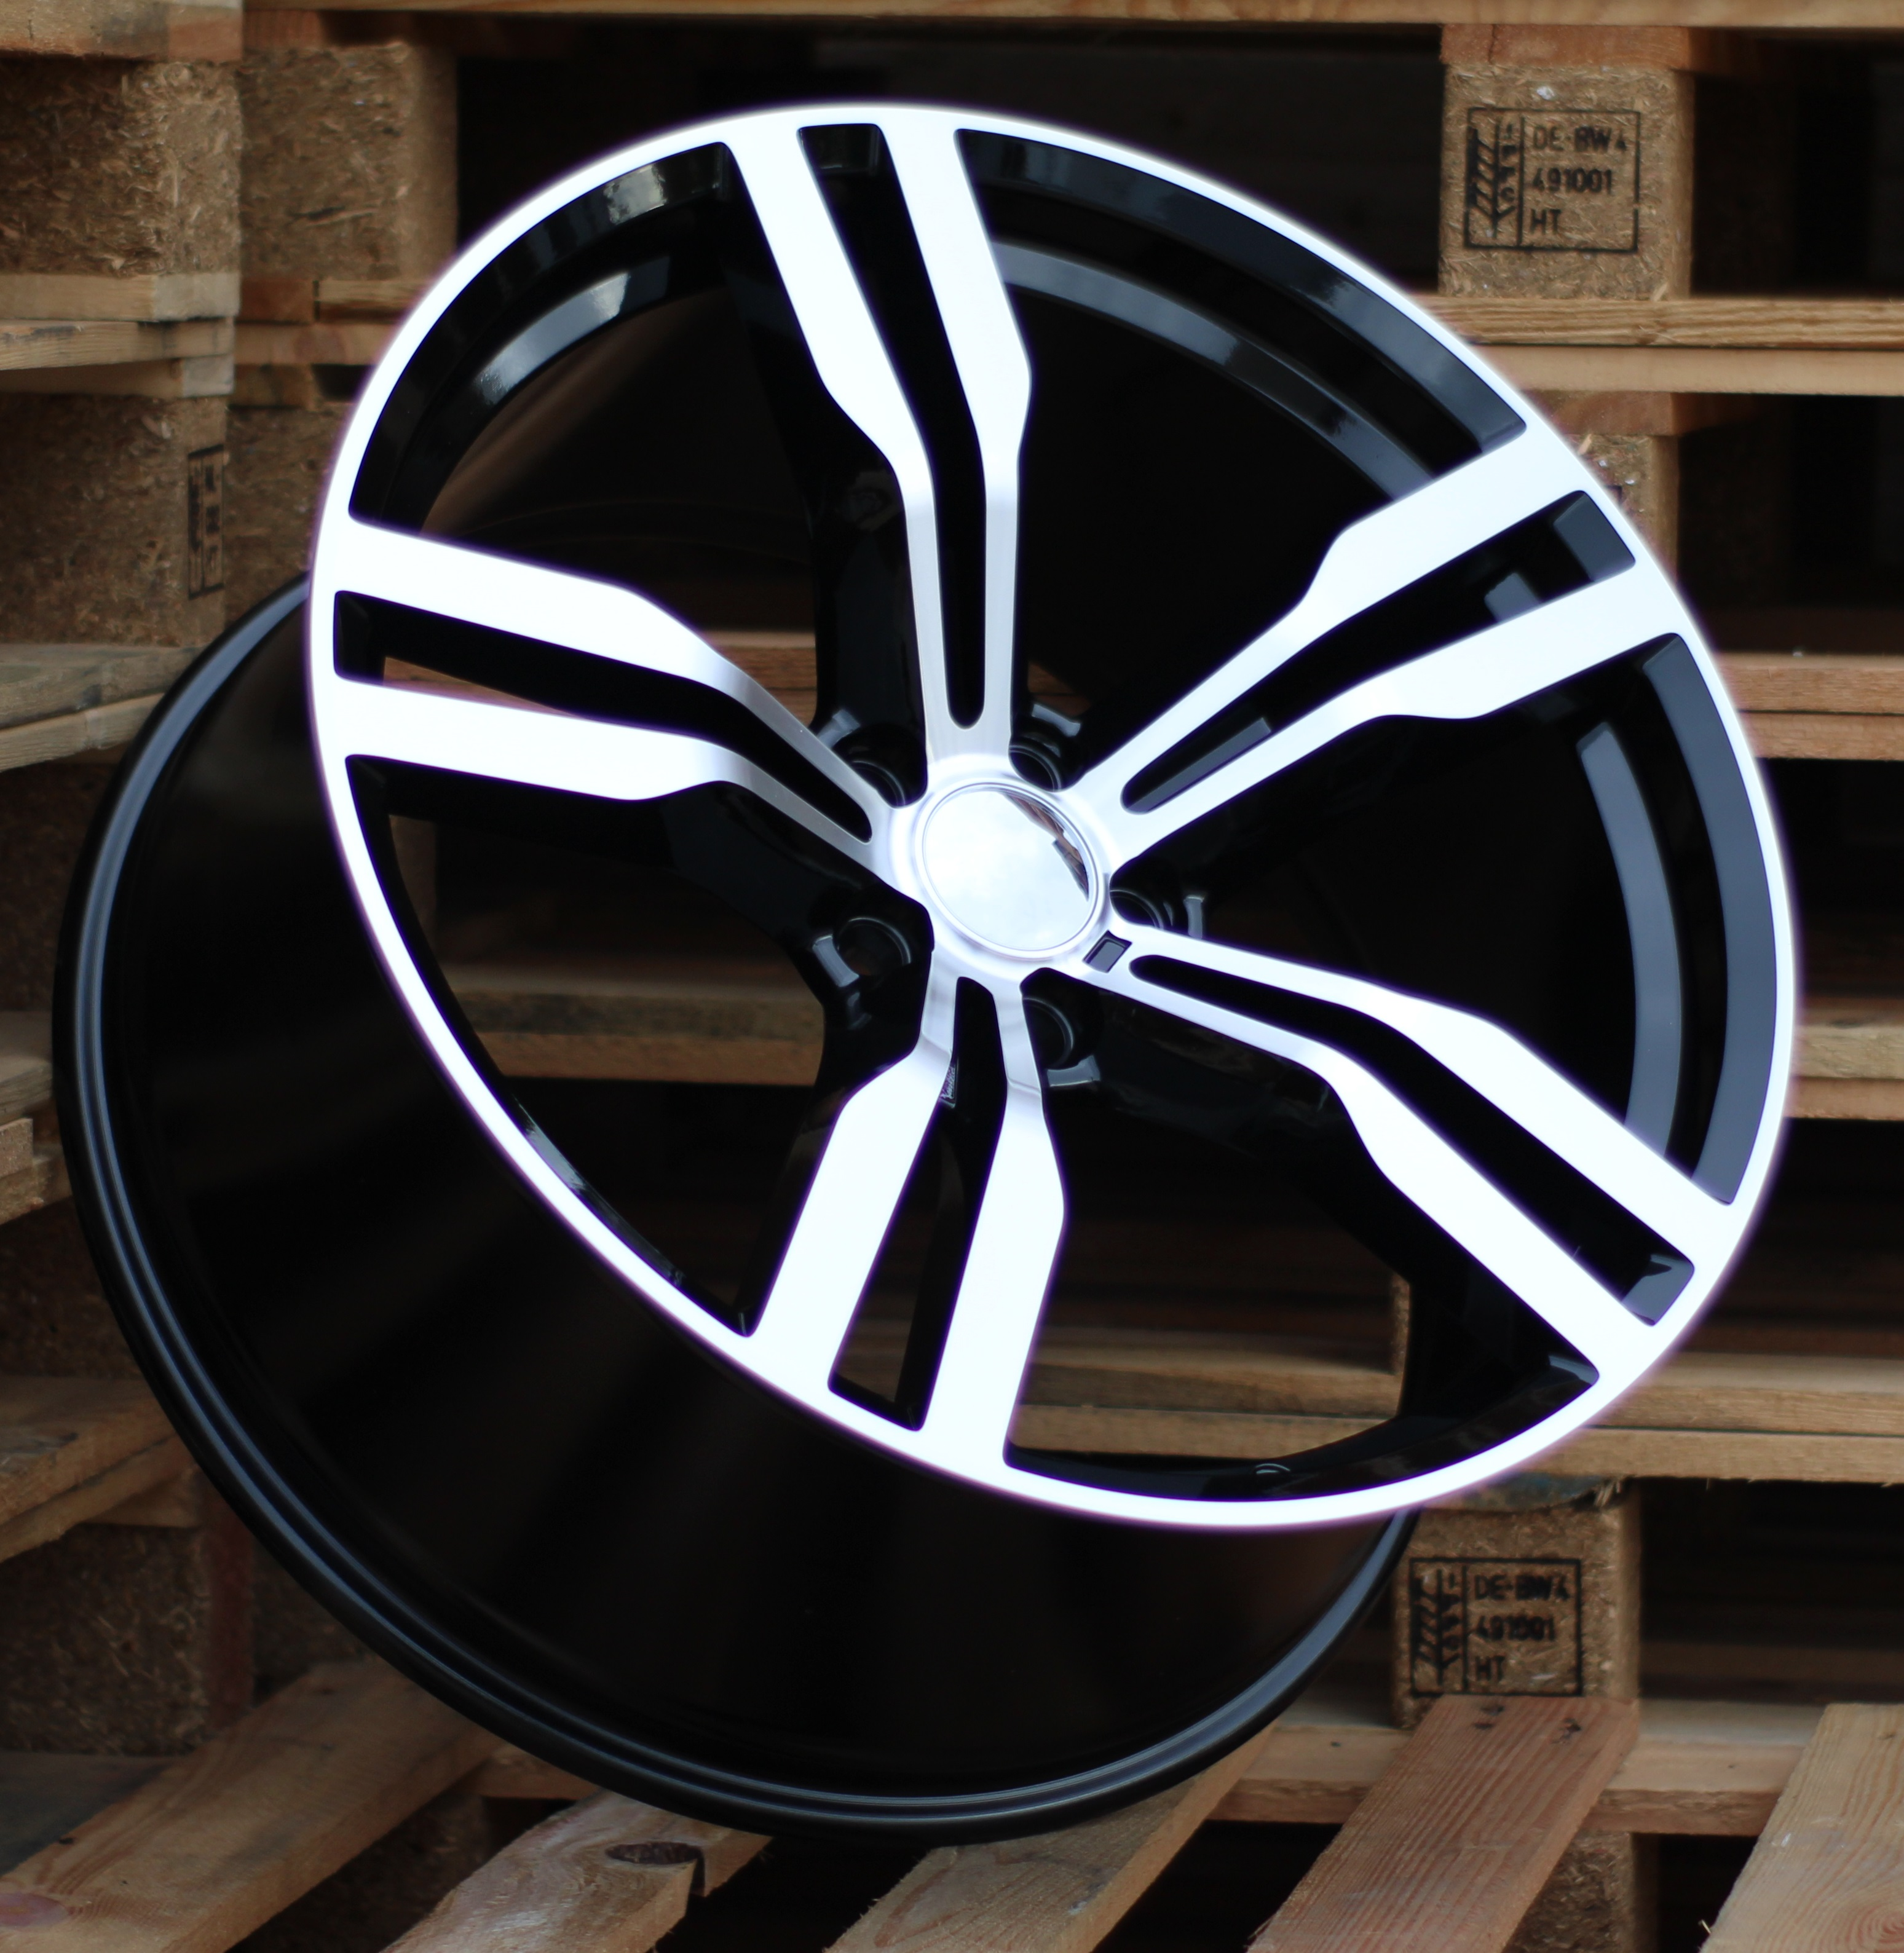 B20X8.5 5x120 ET25 72.56 BK5327 MB+Powder coating (Rear+Front) RWR BM (+5eur) ()## 8.5x20 ET24 5x120